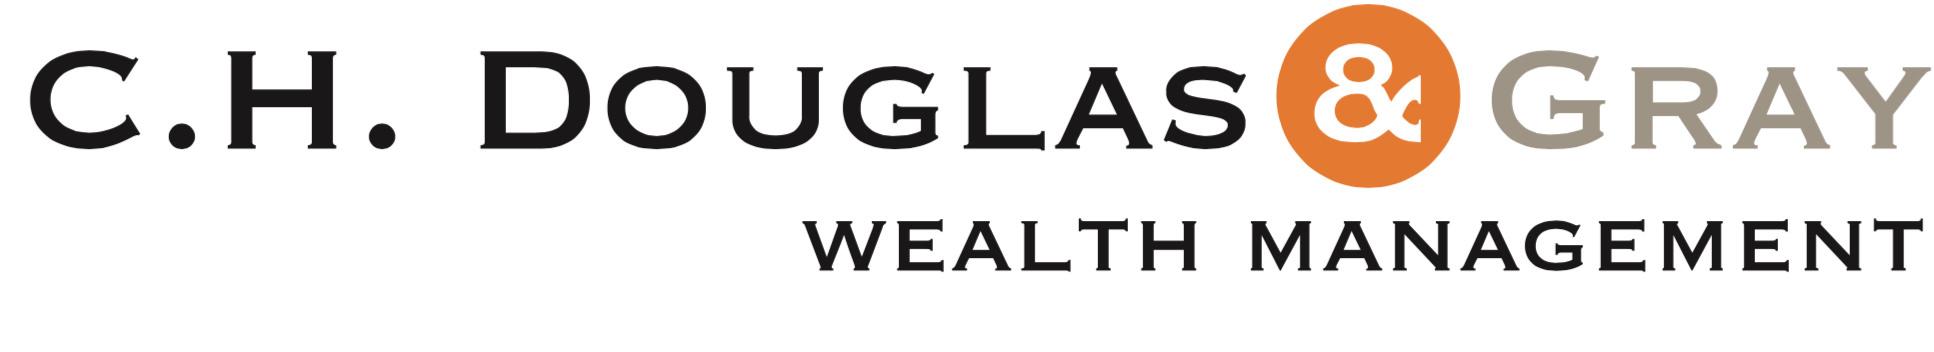 C. H. Douglas & Gray